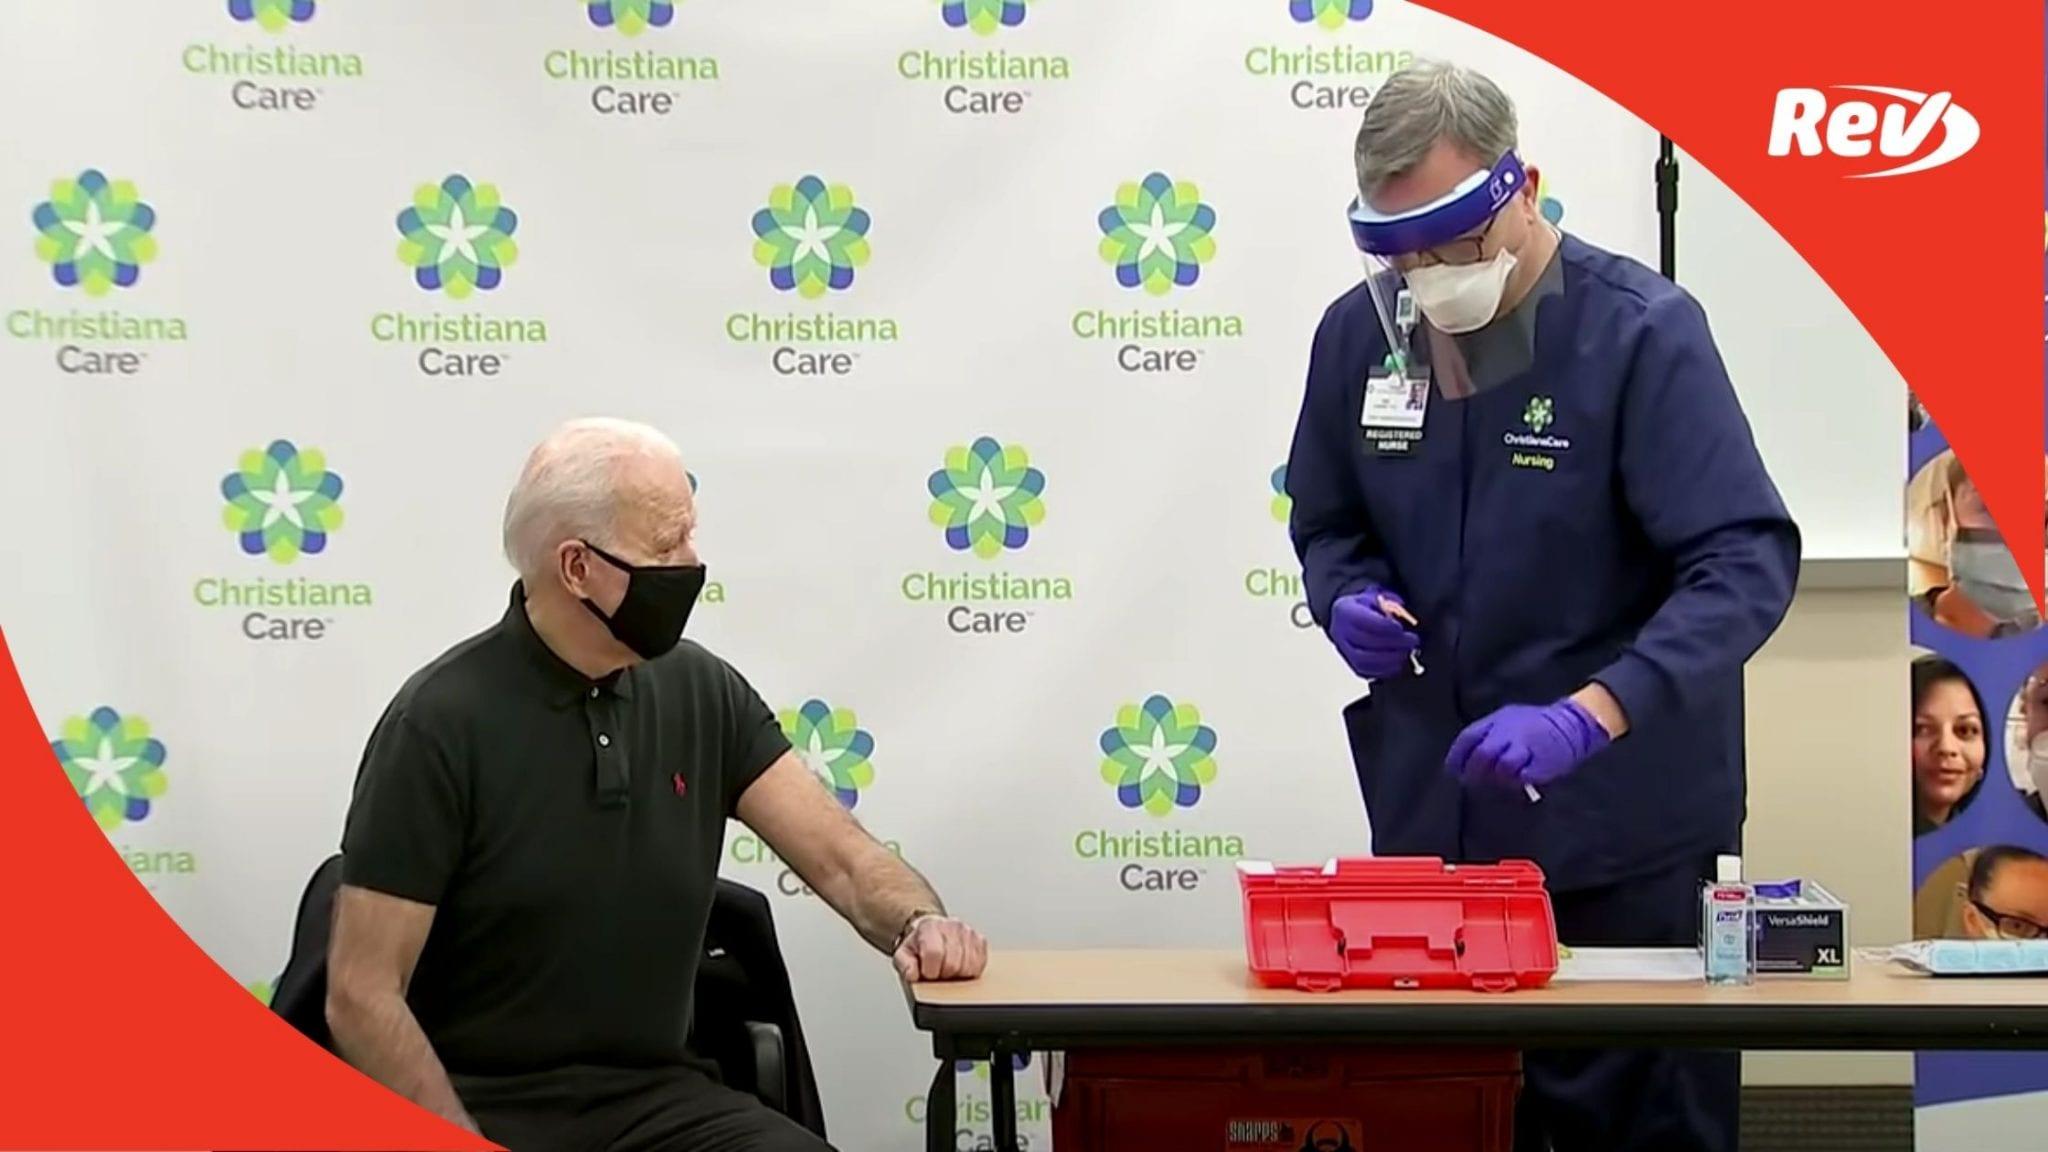 Joe Biden Gets Second COVID-19 Vaccine Dose